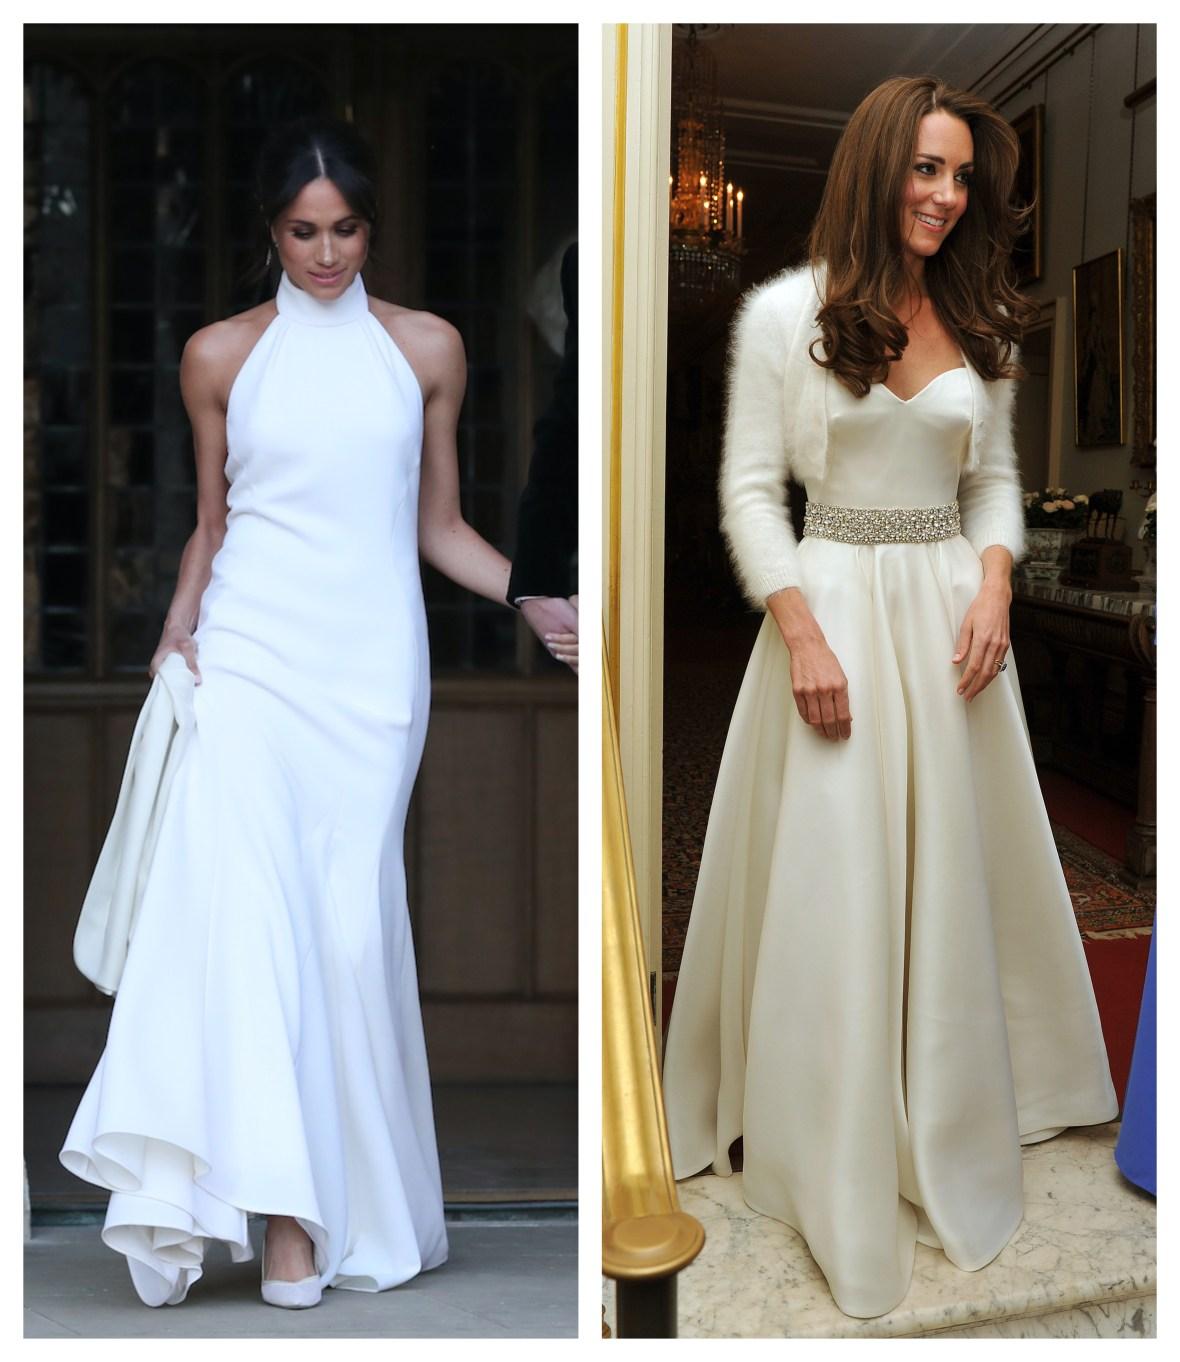 meghan markle kate middleton reception dresses comparison